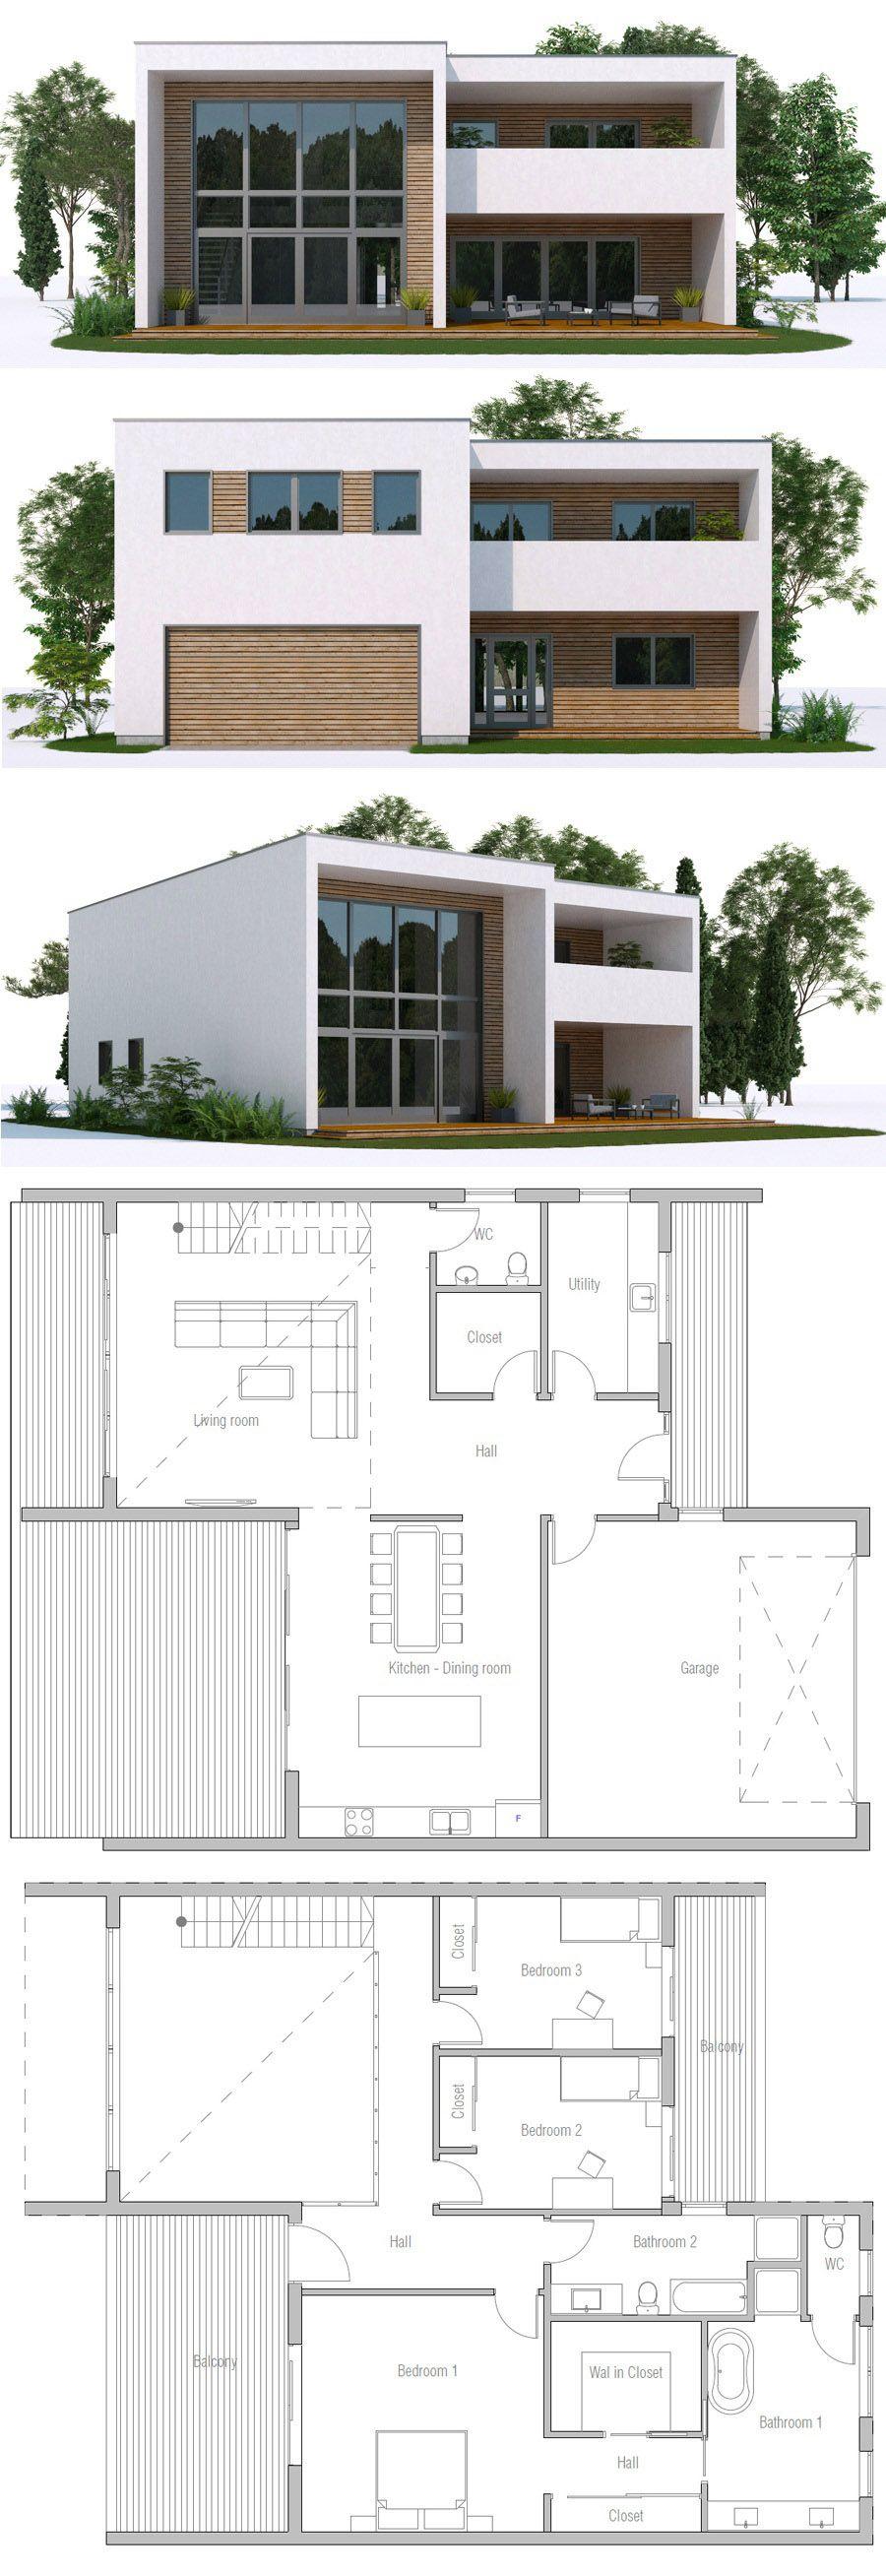 House designs | Revit | Pinterest | House, Balconies and Architecture